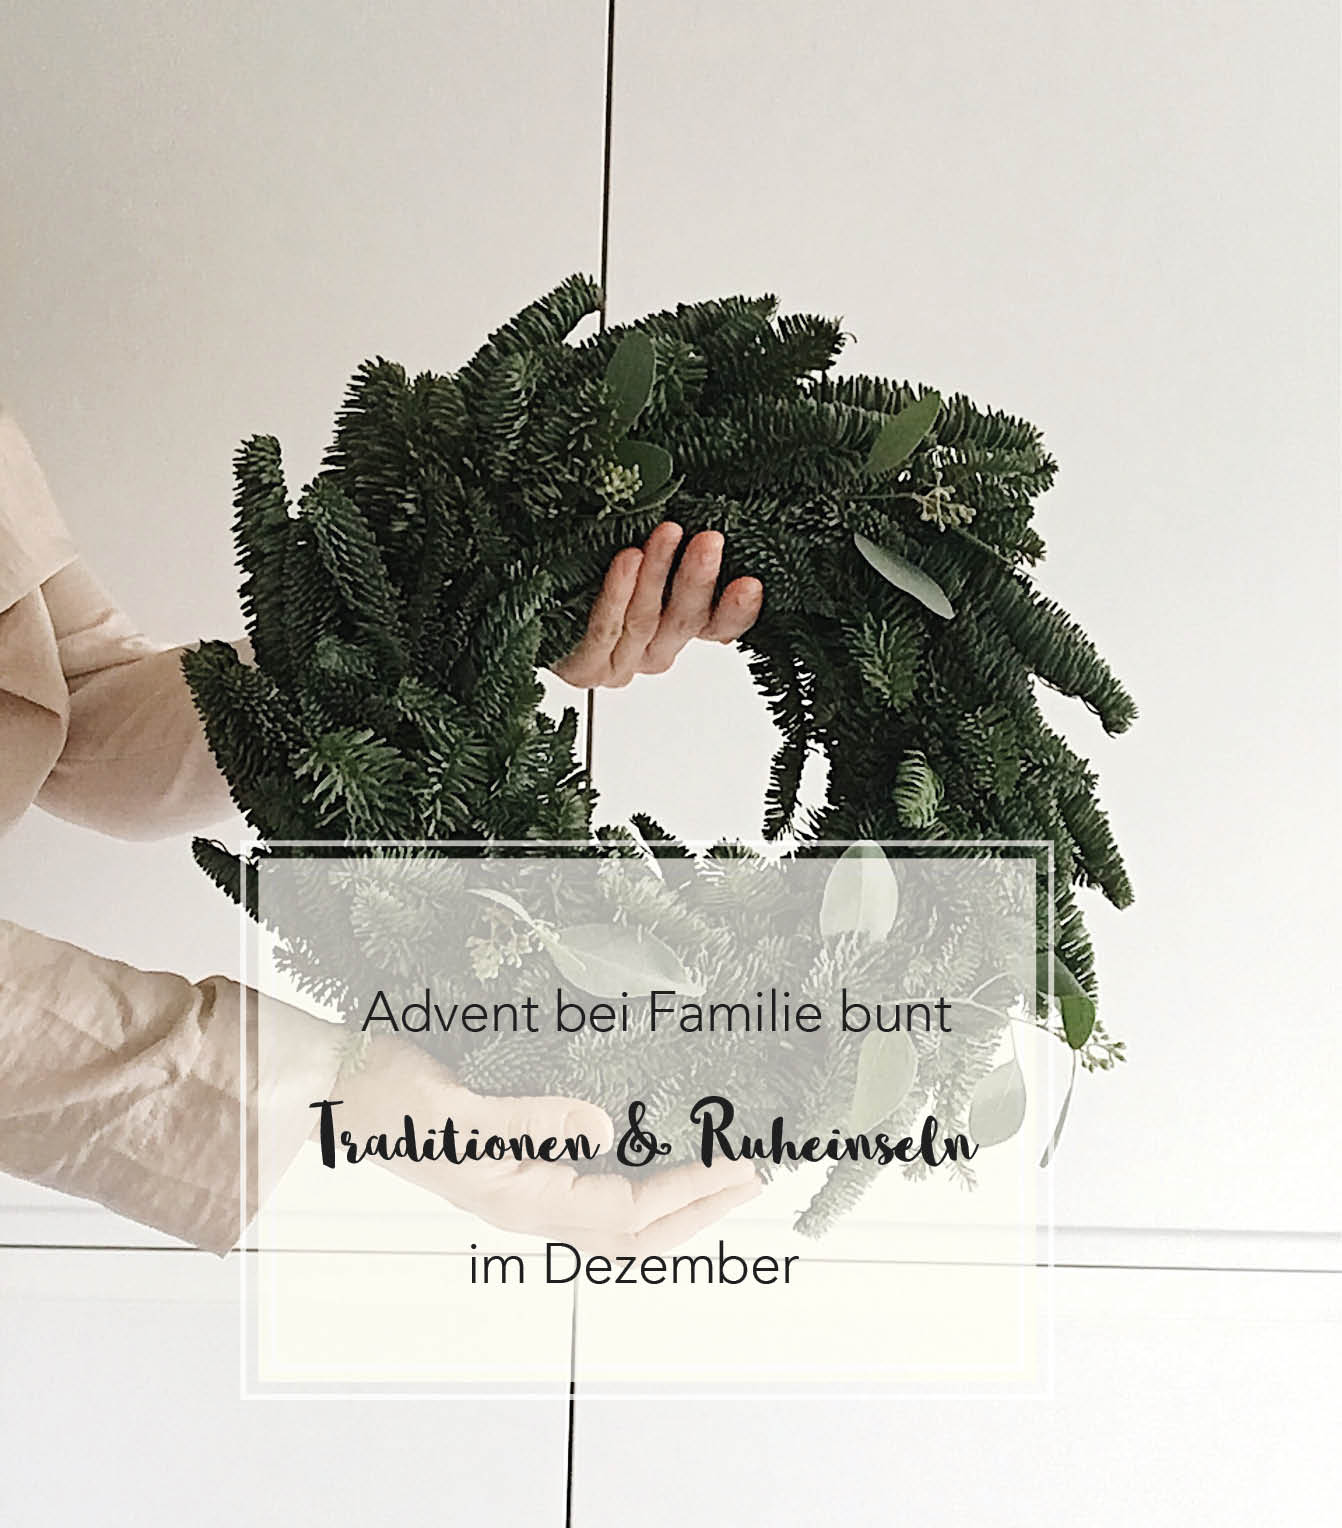 Advent bei Familie bunt Titelbild